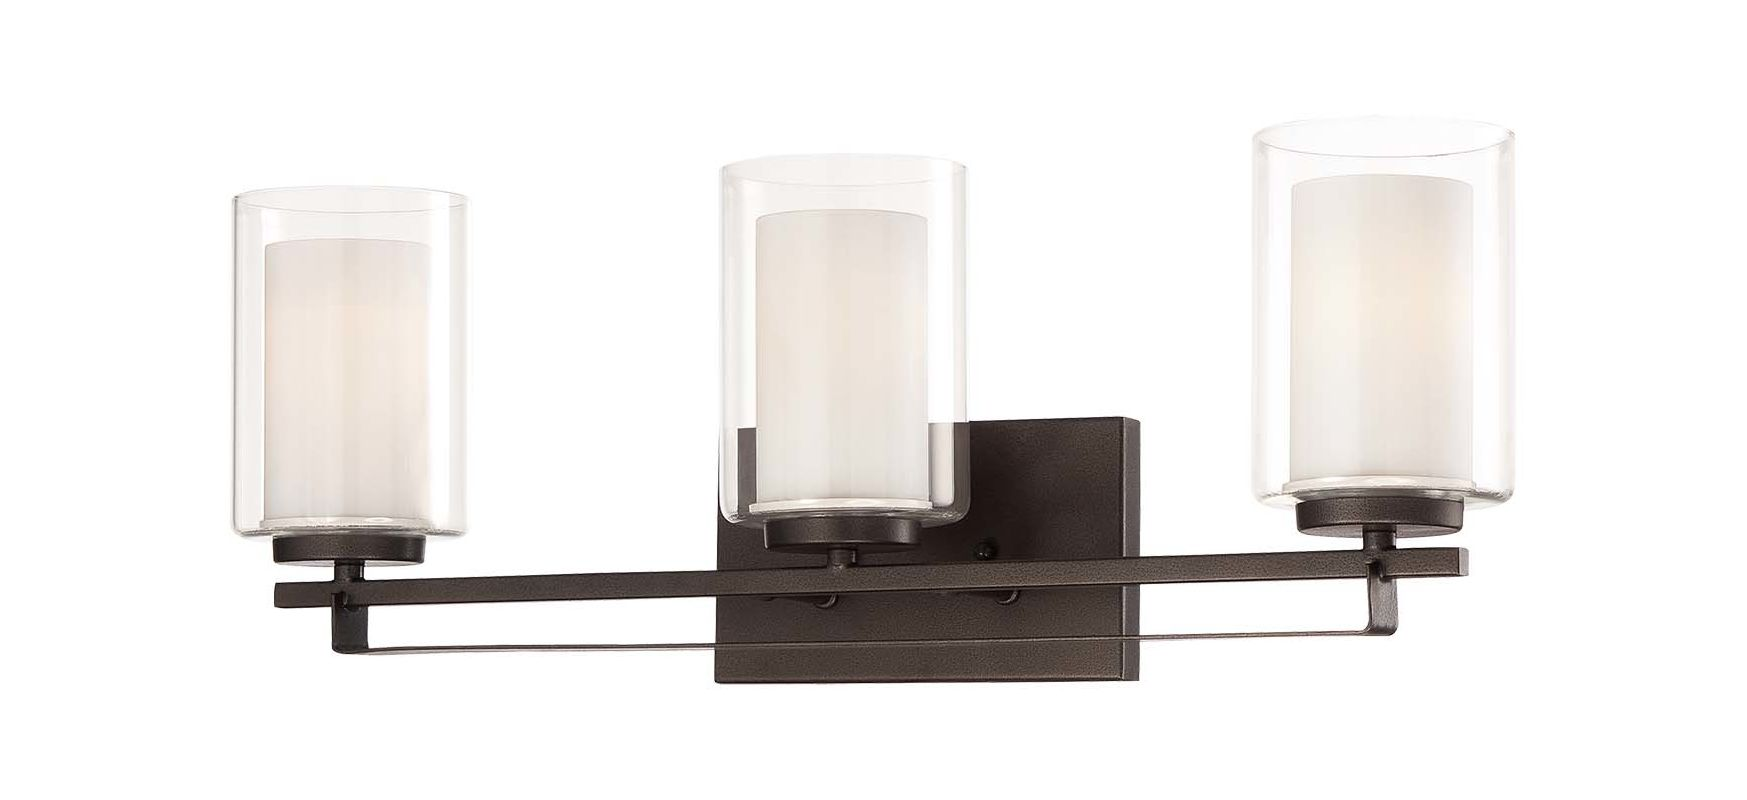 Kichler Barrington 3 Light 22 In Cylinder Vanity Light At: Minka Lavery 6103-172 Smoked Iron 3 Light Bathroom Vanity